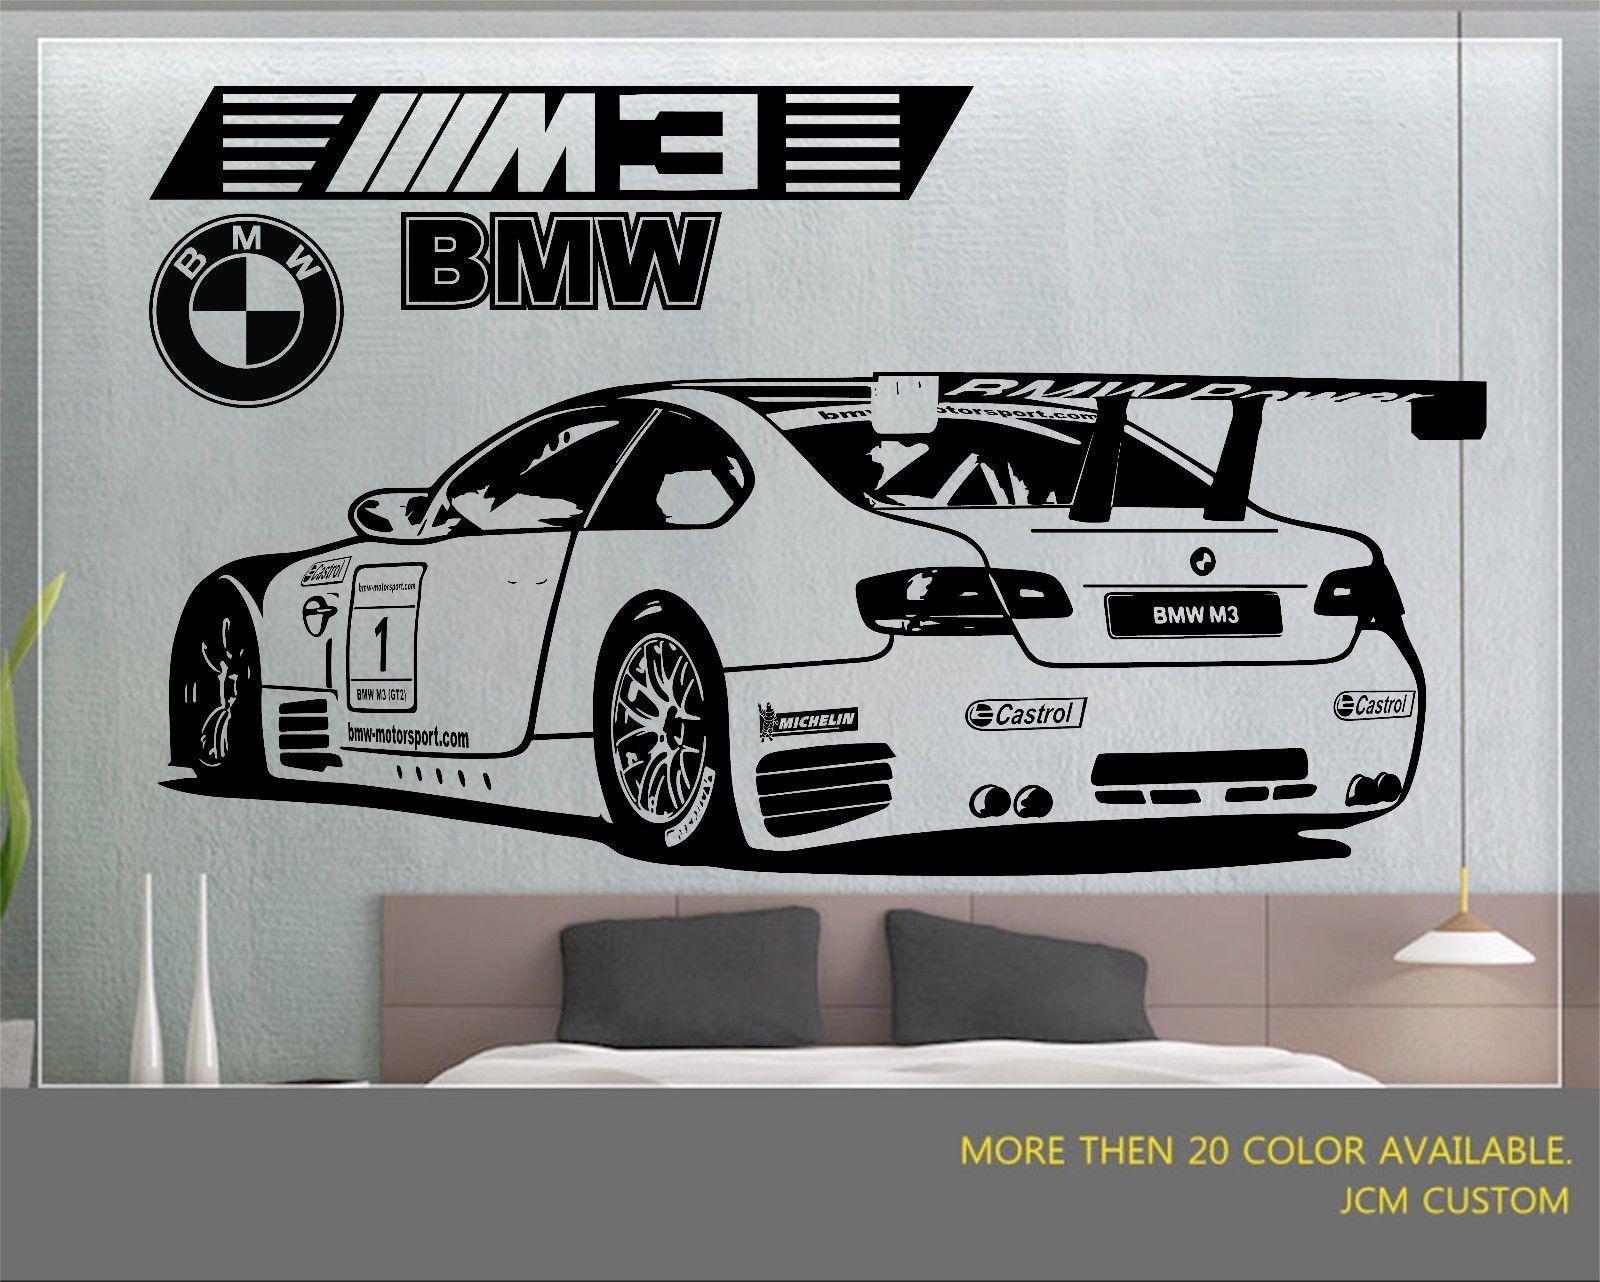 BMW M3 GT2 M-Power Racing Sports Car desmontable de parojo de vinilo autoadhesivo con